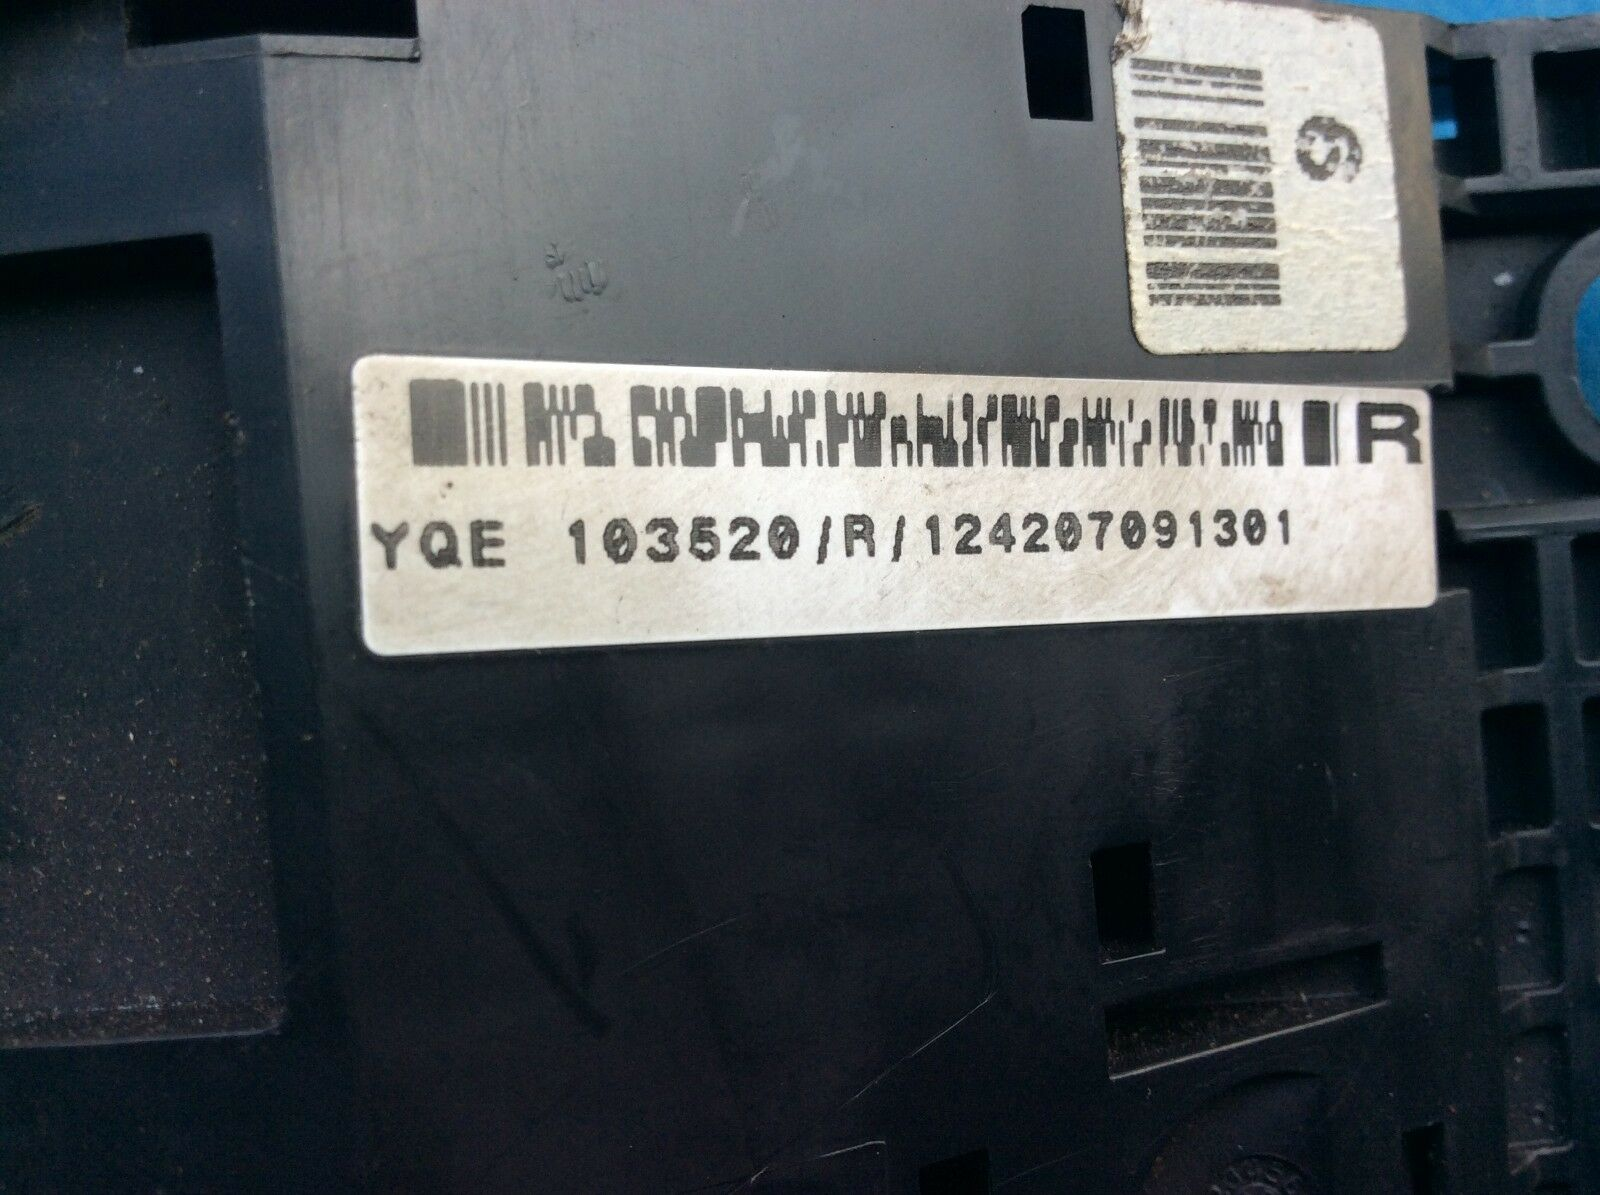 Land Rover Freelander Engine Bay Fuse Box (Part Number: YQE103520)